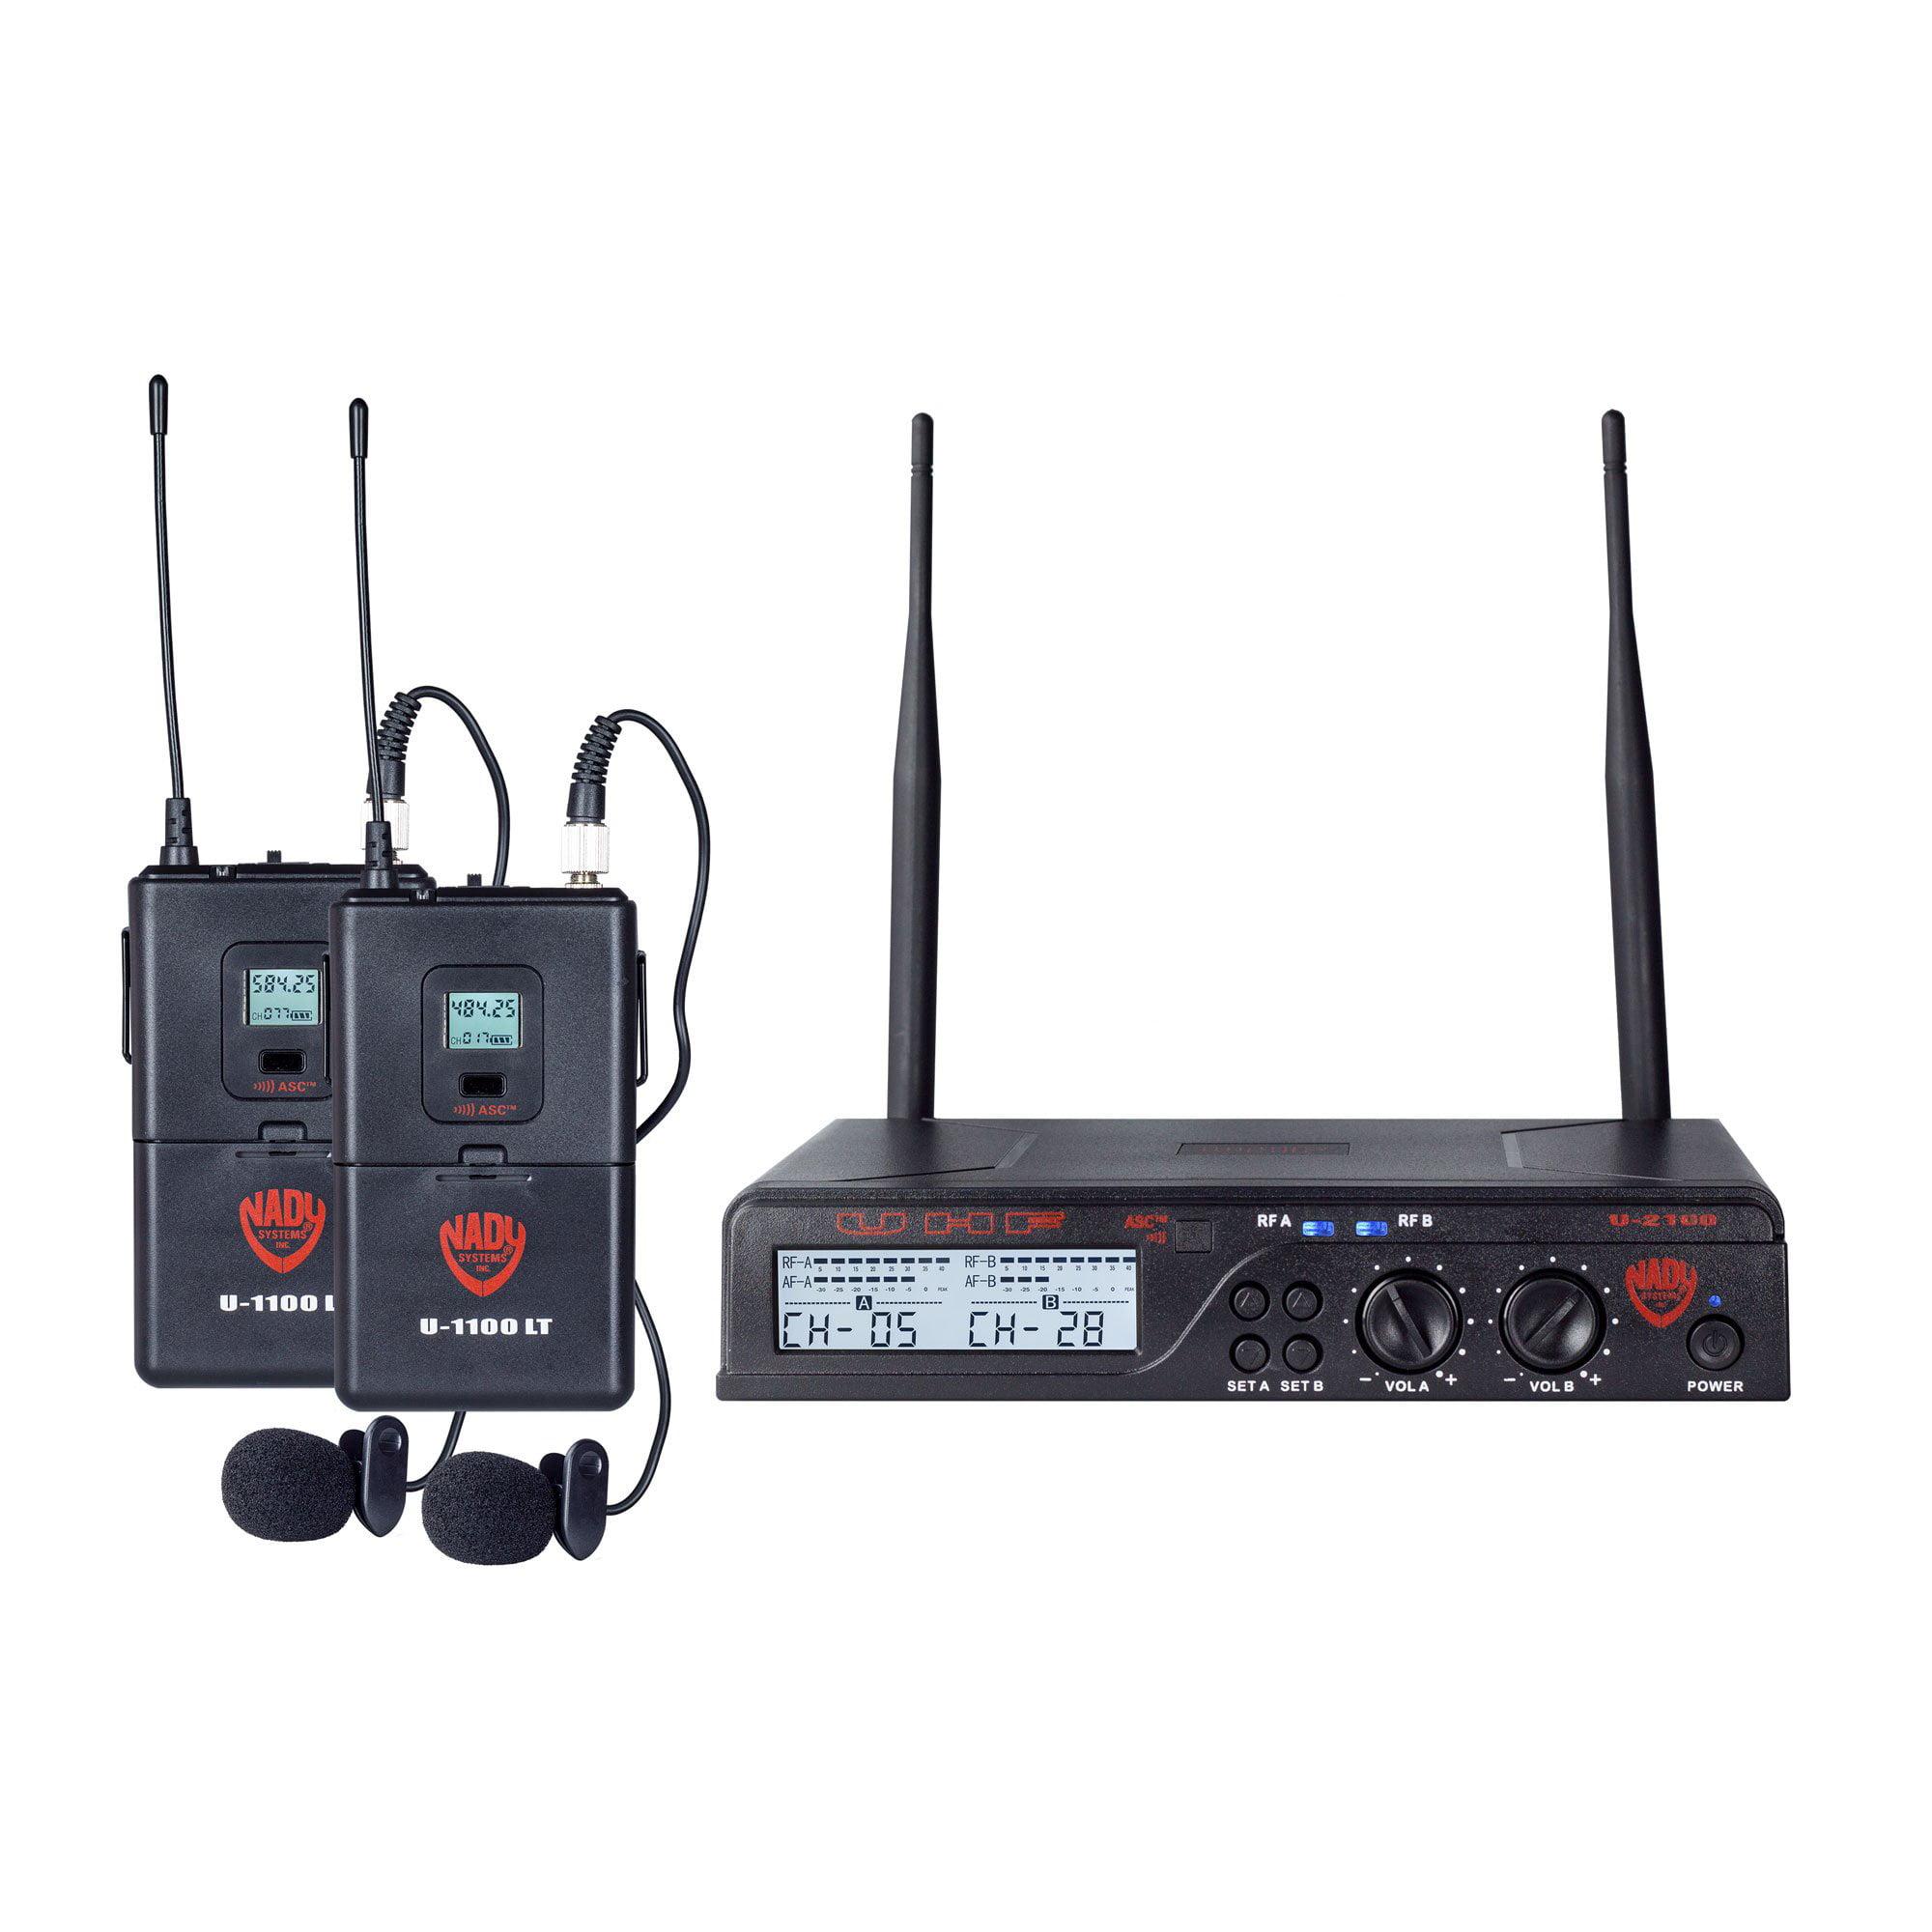 Nady U-2100LT/O(BANDA/B) U-2100 Lt/o [band A/b] Uhf Dual 100-channel Wireless Lavalier Handheld Microphone System